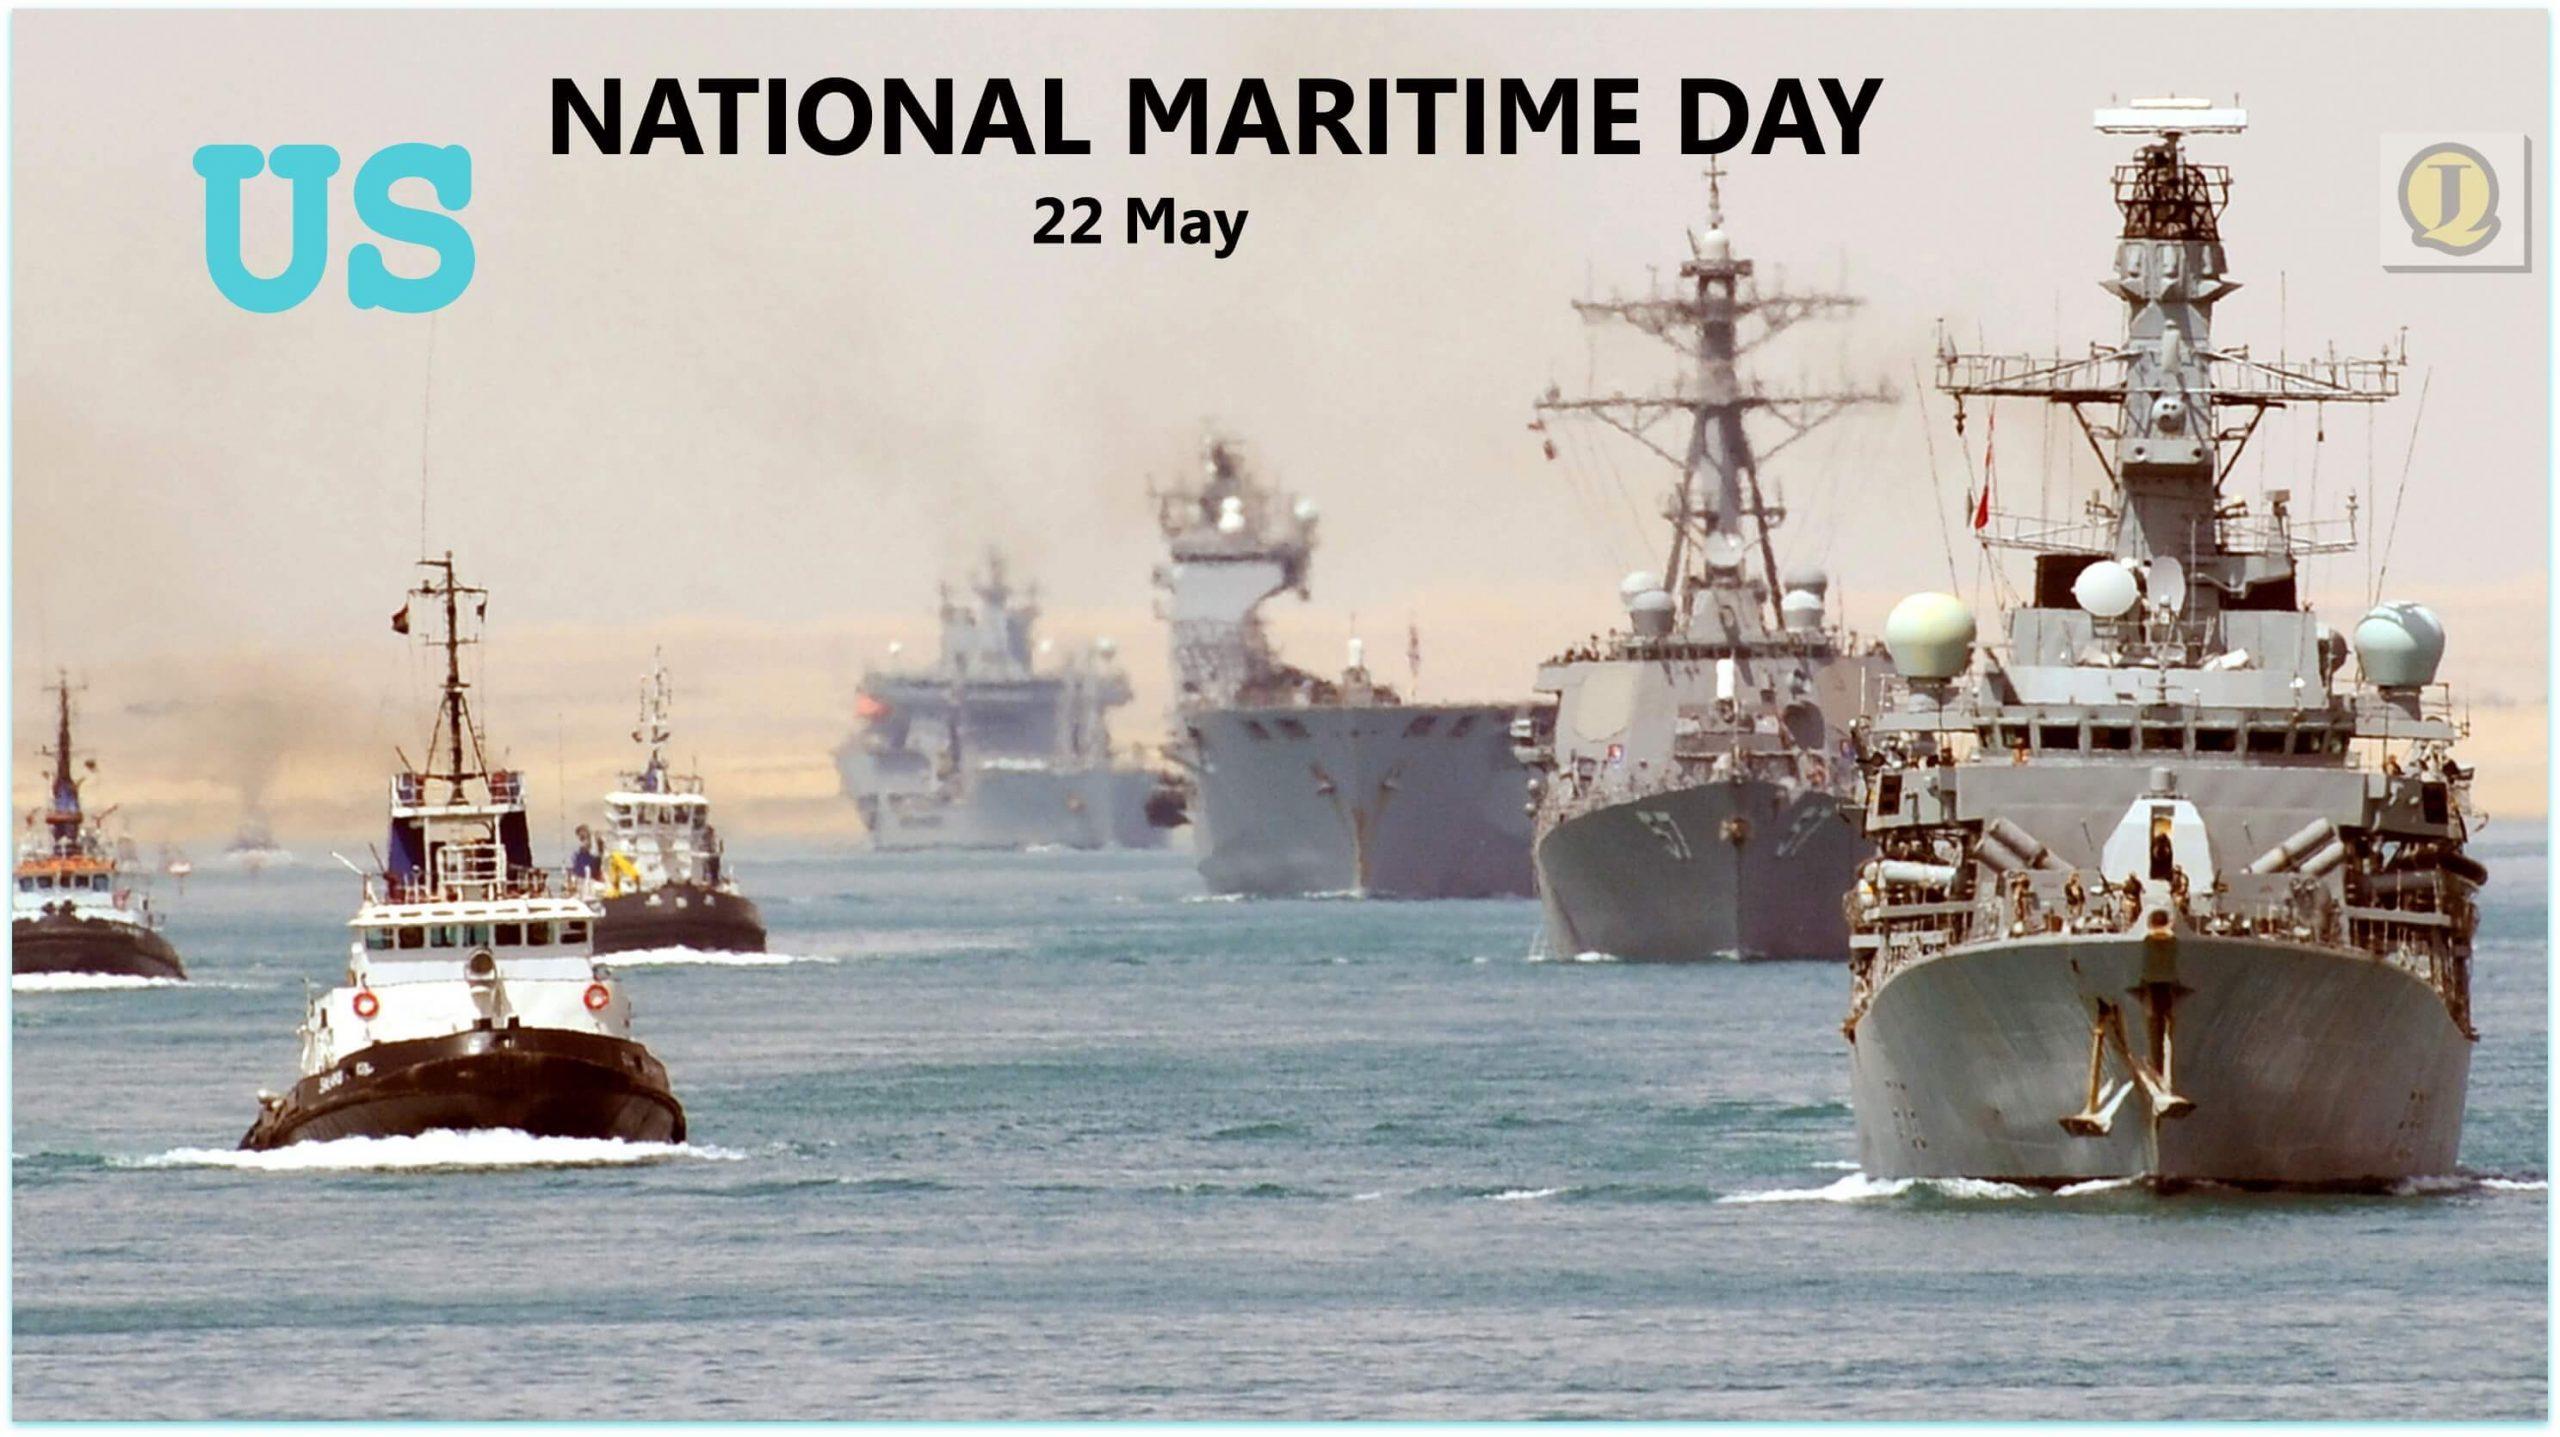 United States National Maritime Day